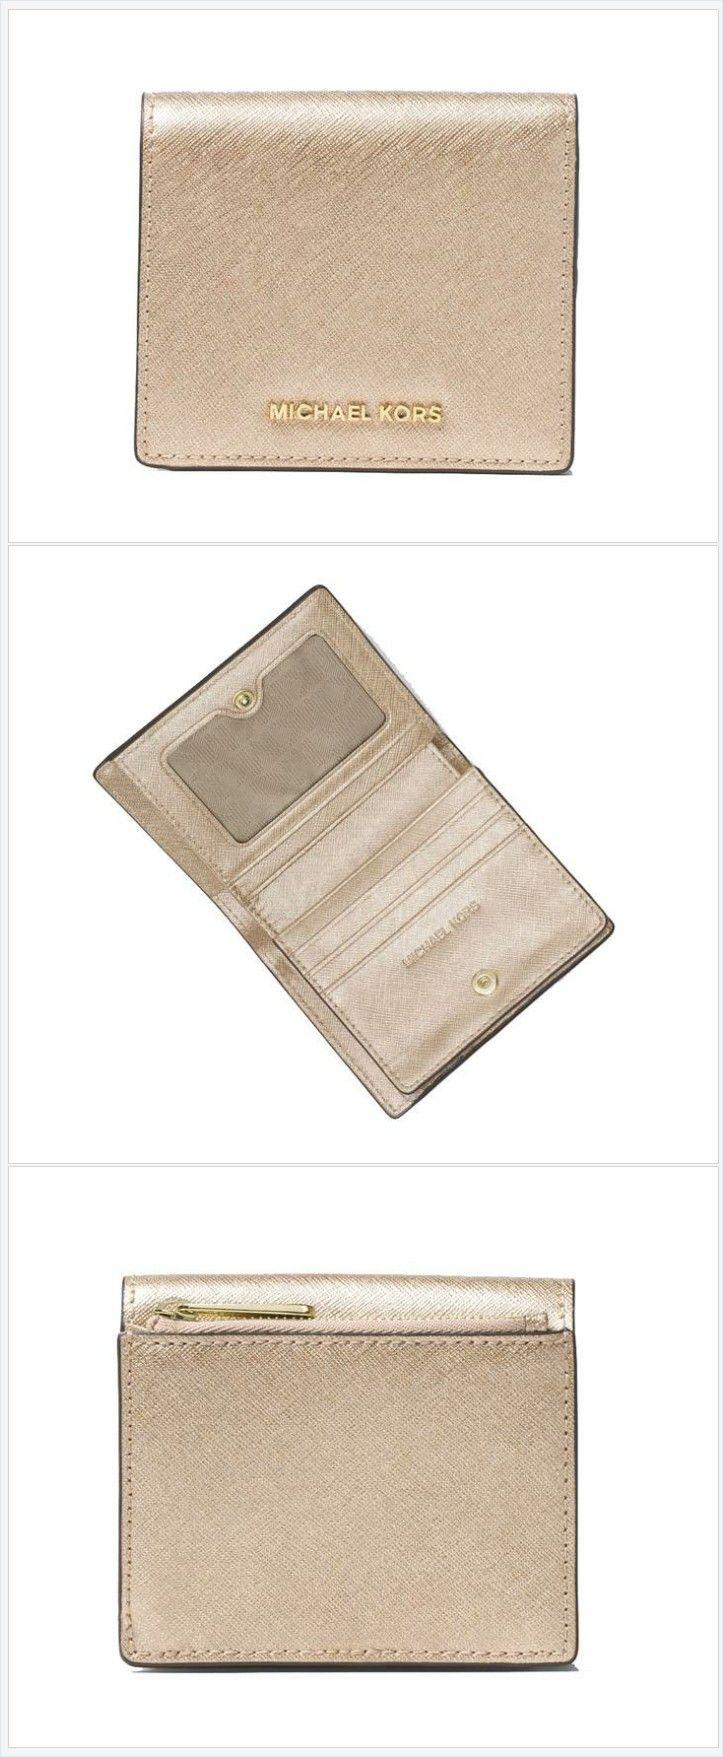 Michael Kors Jet Set Travel Carryall Card Case https://www.tradesy.com/accessories/michael-kors-michael-kors-jet-set-travel-carryall-card-case-21687125/?tref=closet https://www.tradesy.com/accessories/michael-kors-michael-kors-jet-set-travel-carryall-card-case-21687125/?tref=closet